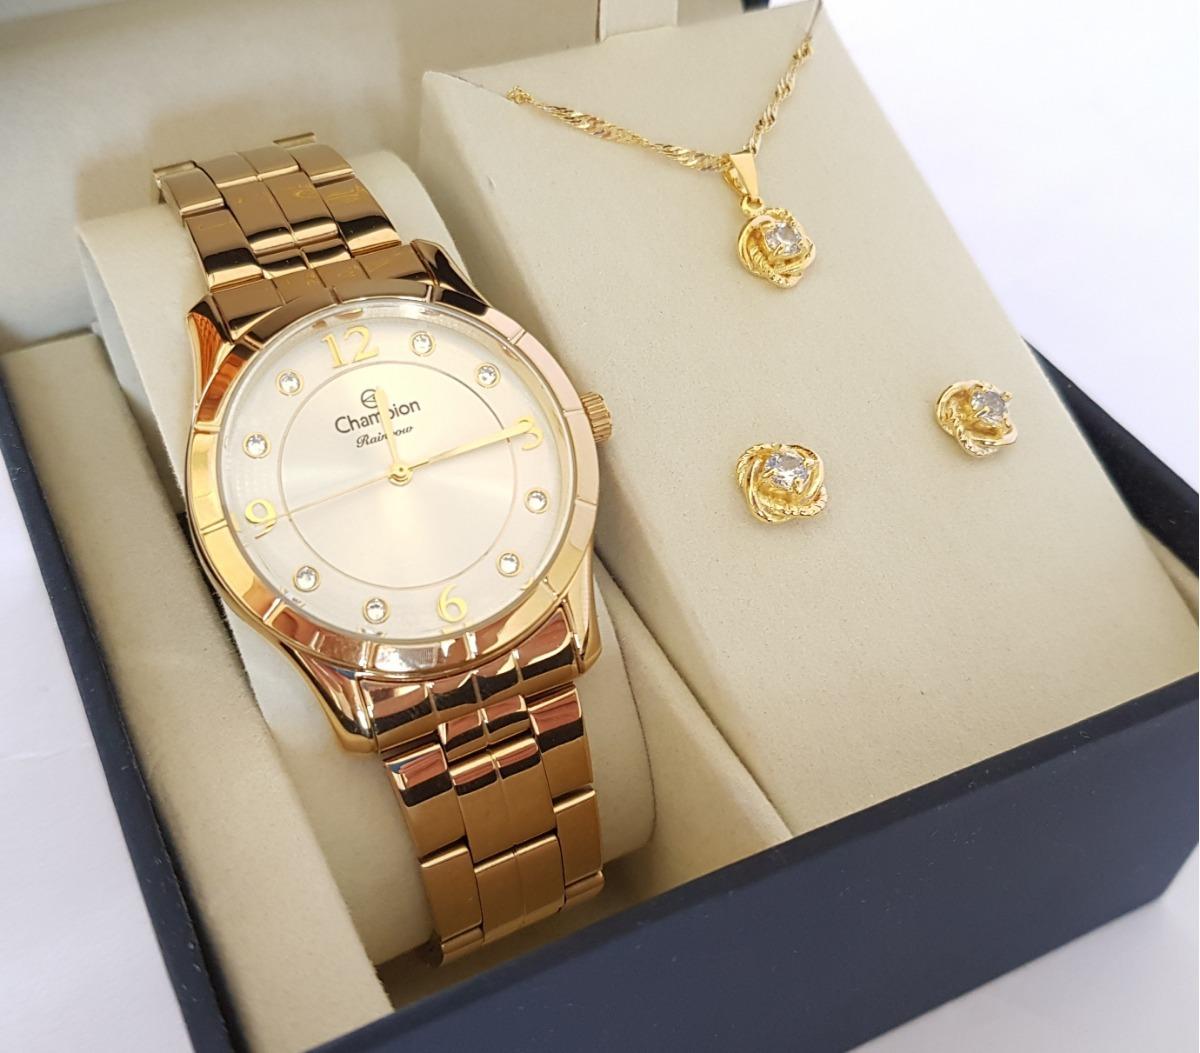 c90ad803b relógio champion feminino dourado kit colar brincos cn29909w. Carregando  zoom.